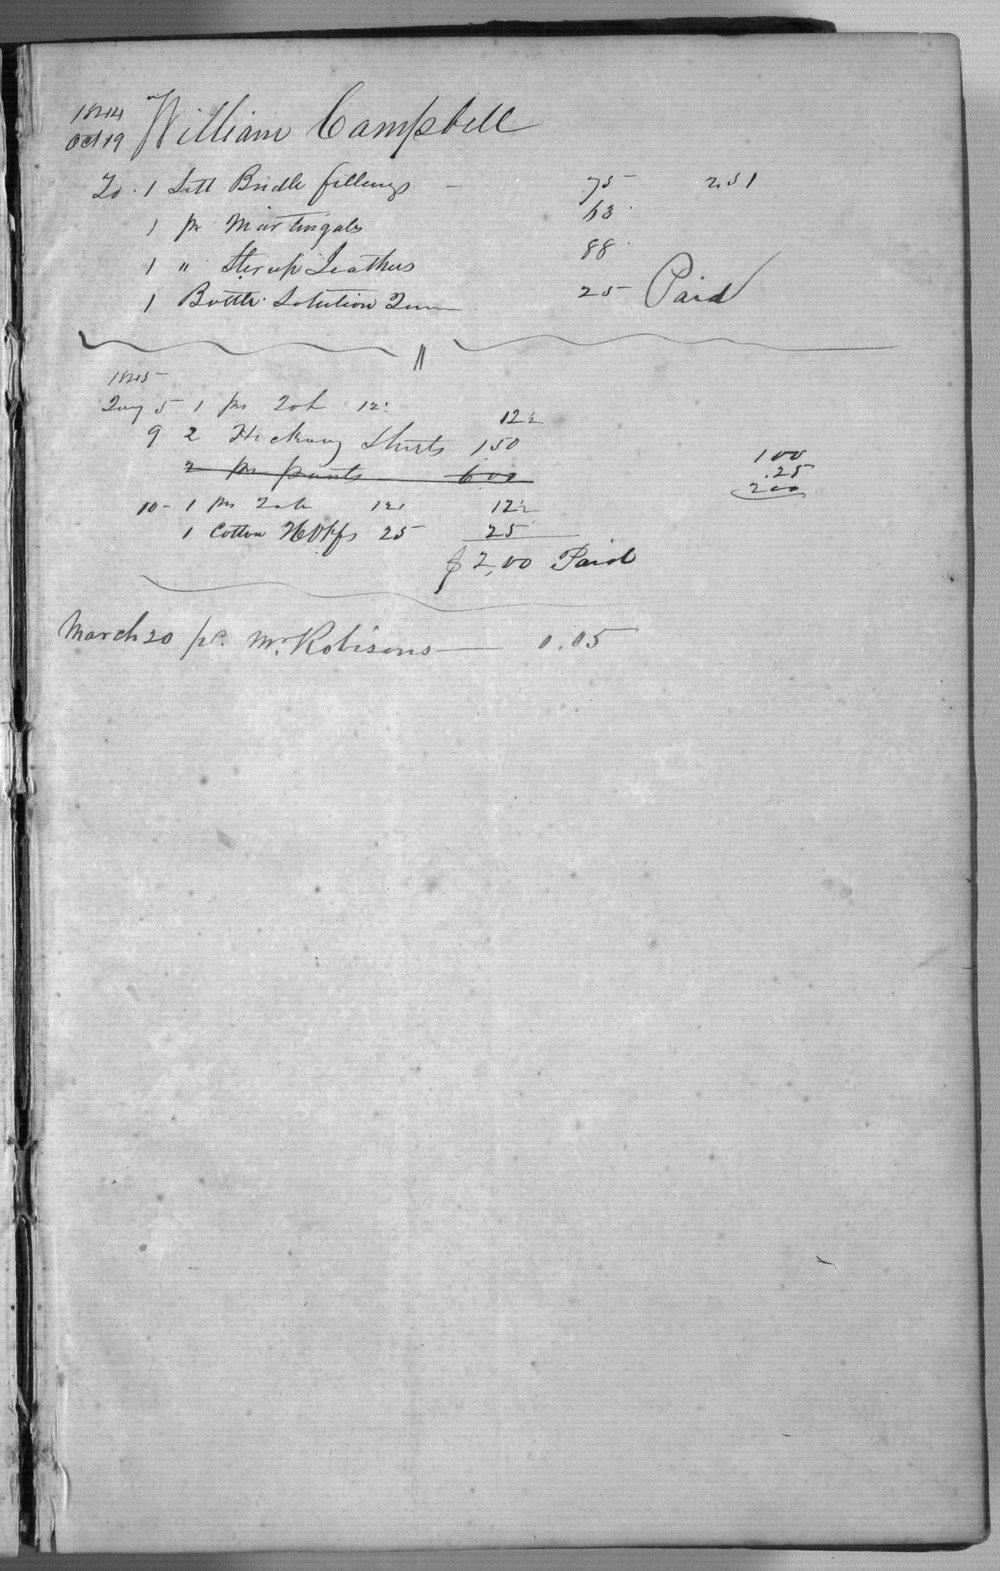 Post sutler's day book, Fort Scott - 5